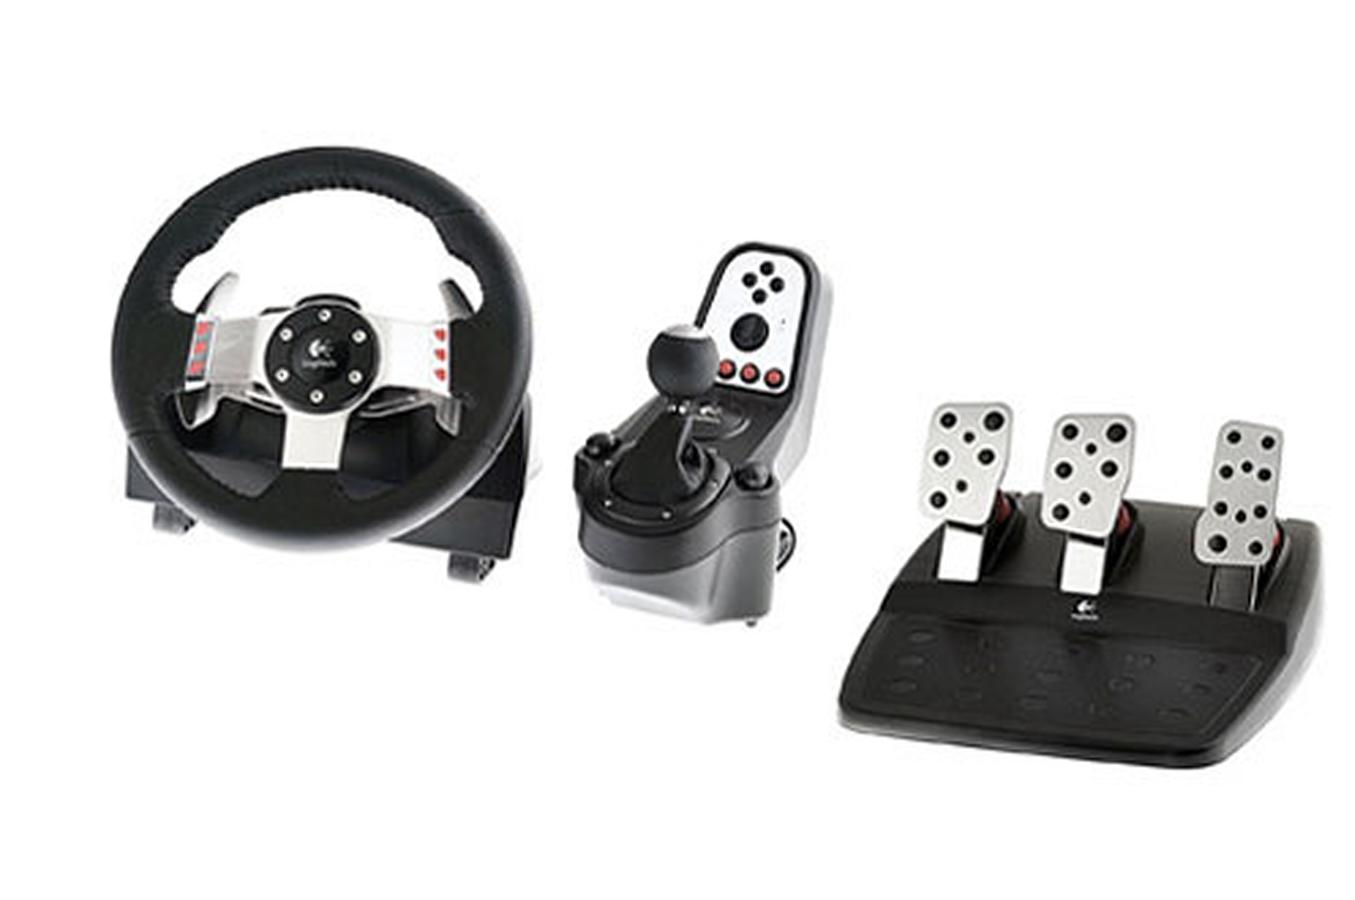 joystick logitech g27 racing wheel 1270141 darty. Black Bedroom Furniture Sets. Home Design Ideas